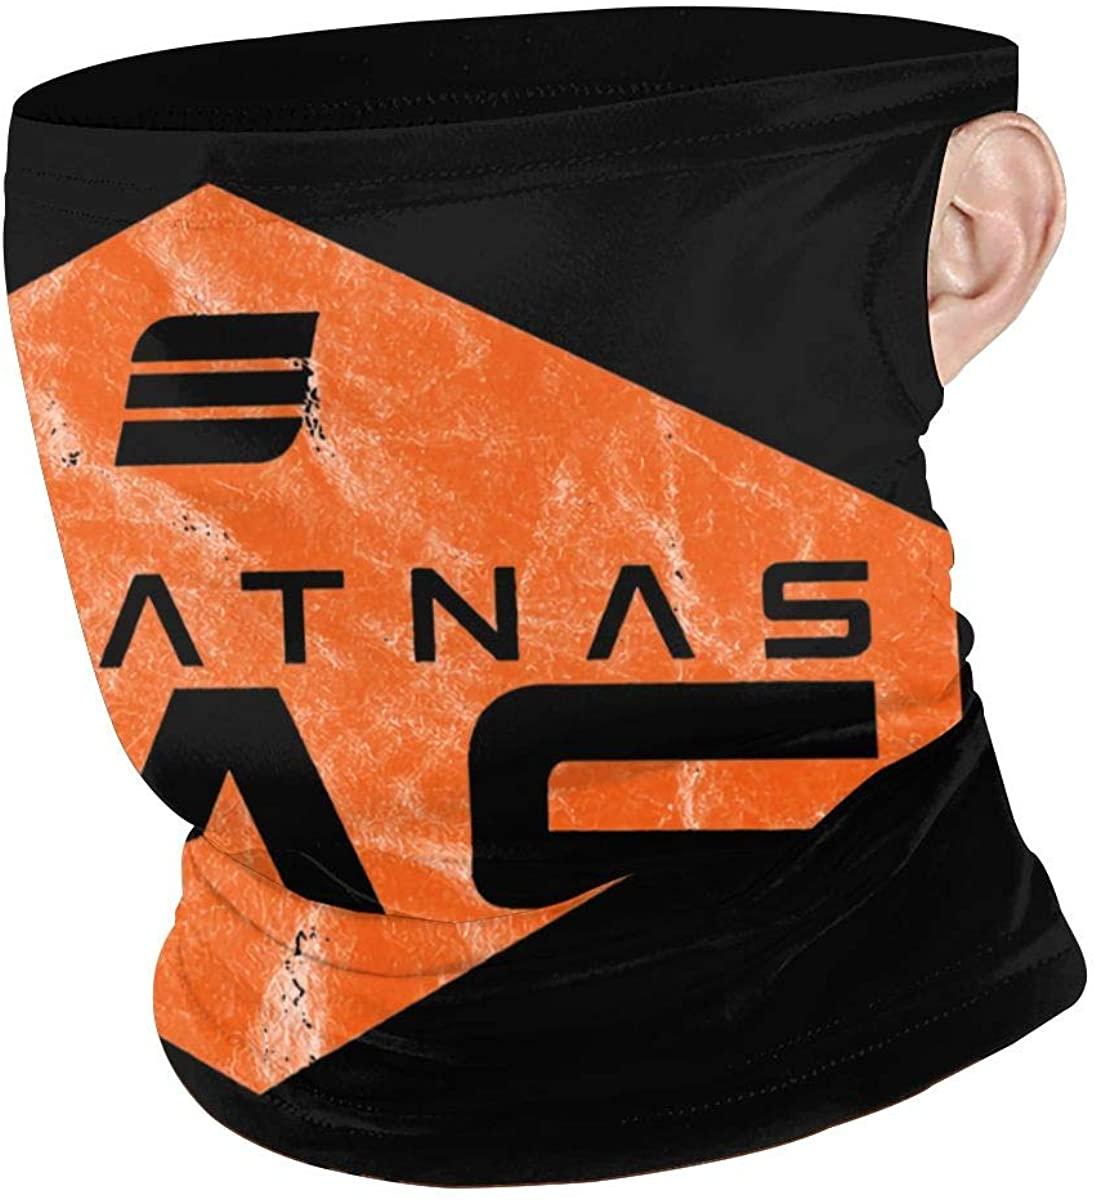 Beratnas Gas Logo Face Shield Scarf, Ear Hanging Windproof Seamless Women Man Neck Gaiter